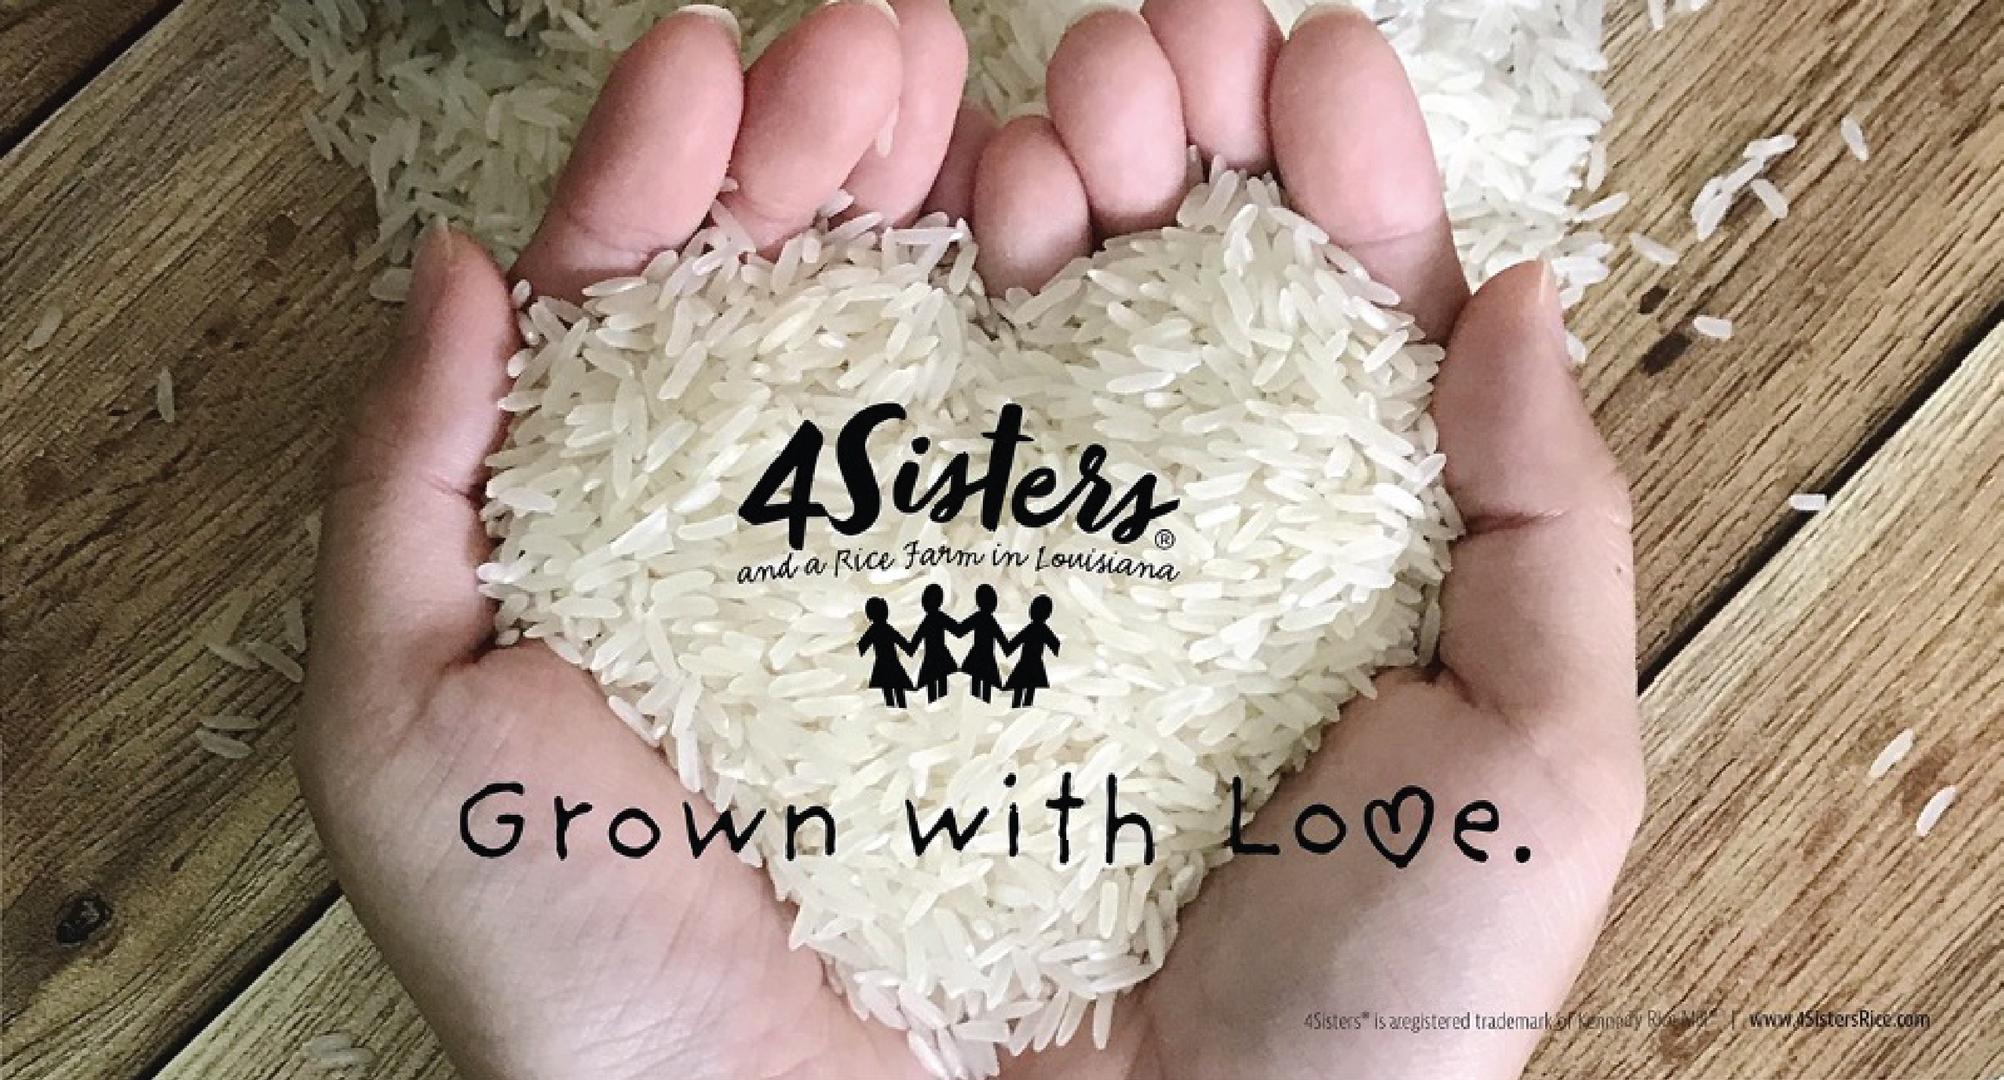 4Sisters Social Media Campaign